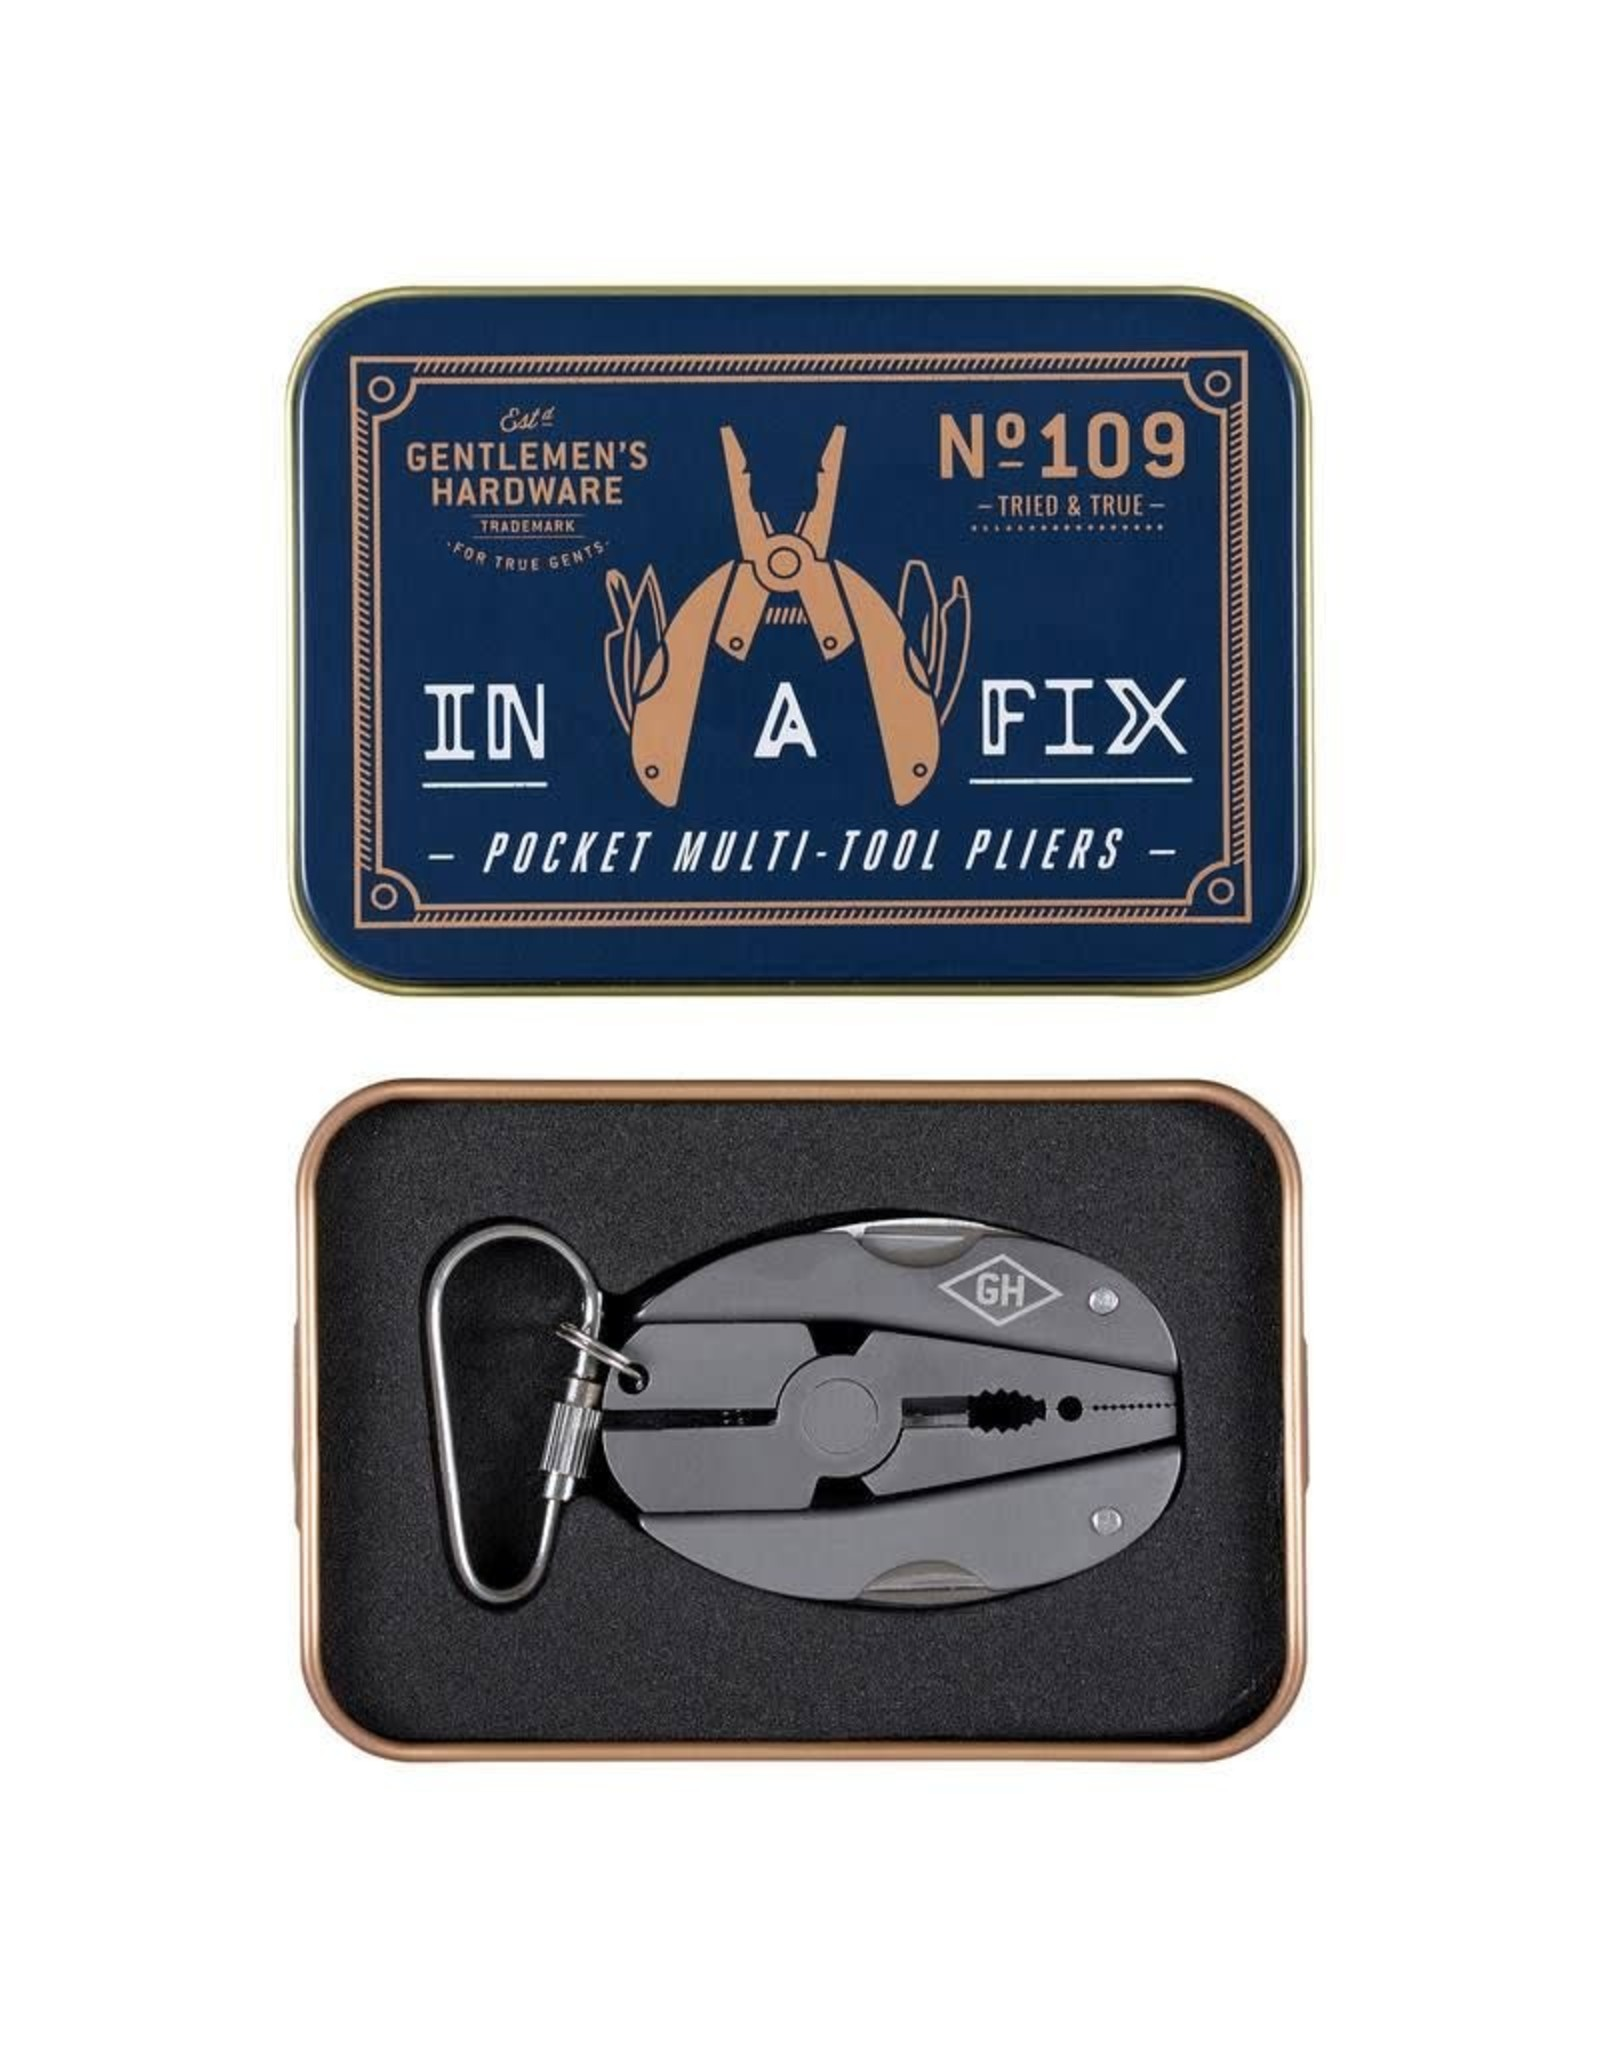 Gentlemen's Hardware Pocket Multi-Tool Pliers Titanium Finish